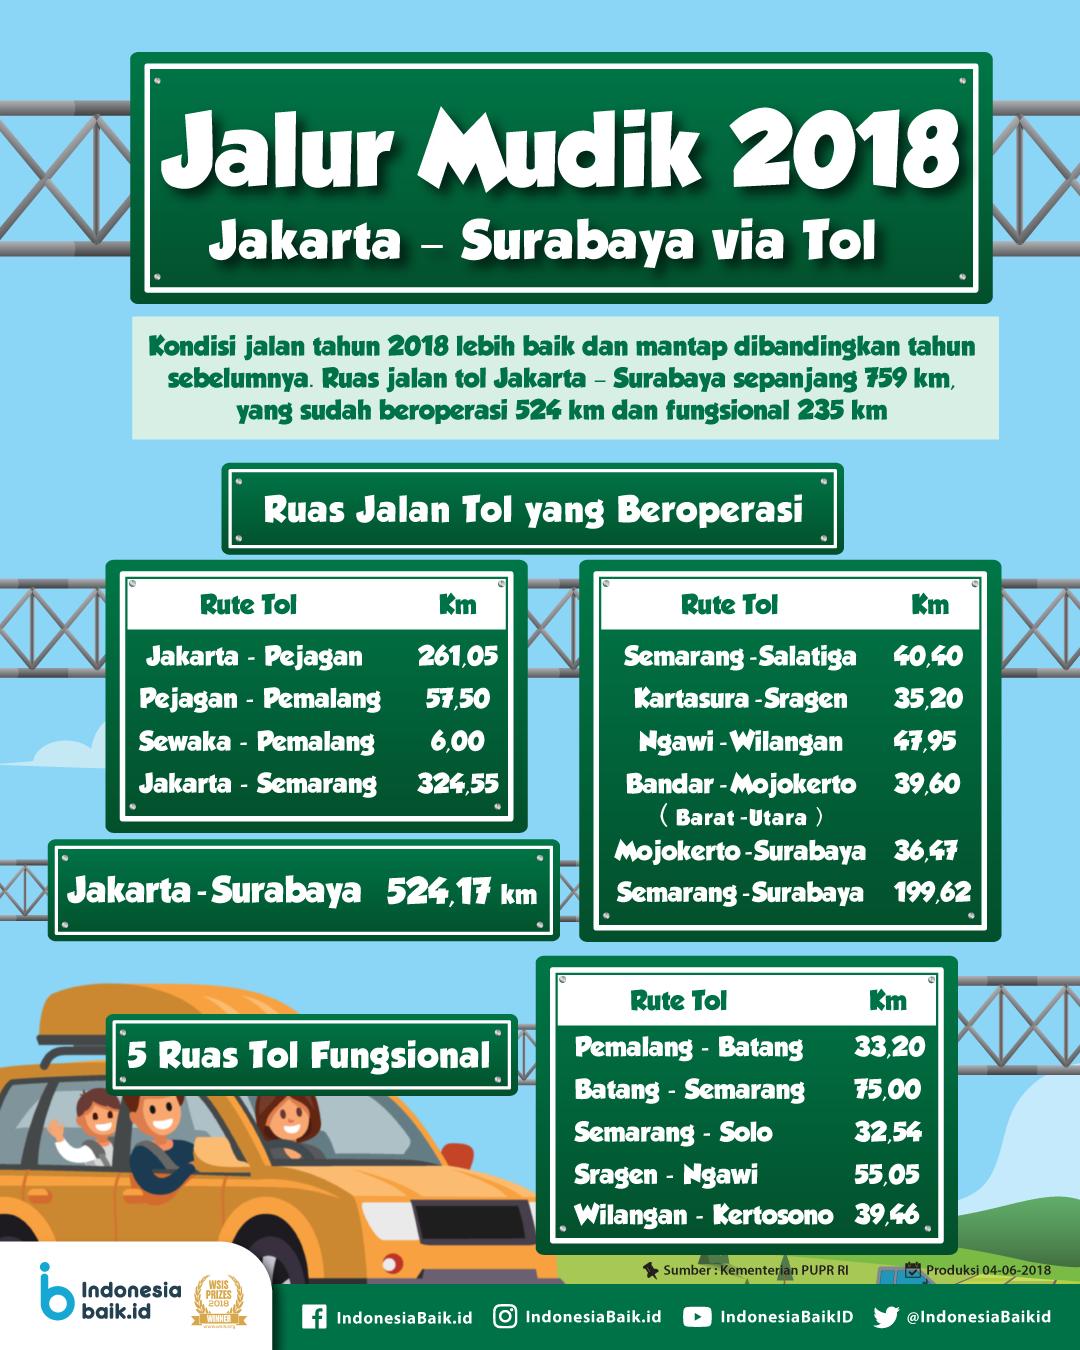 Jalur Mudik 2018: Jakarta - Surabaya via Tol